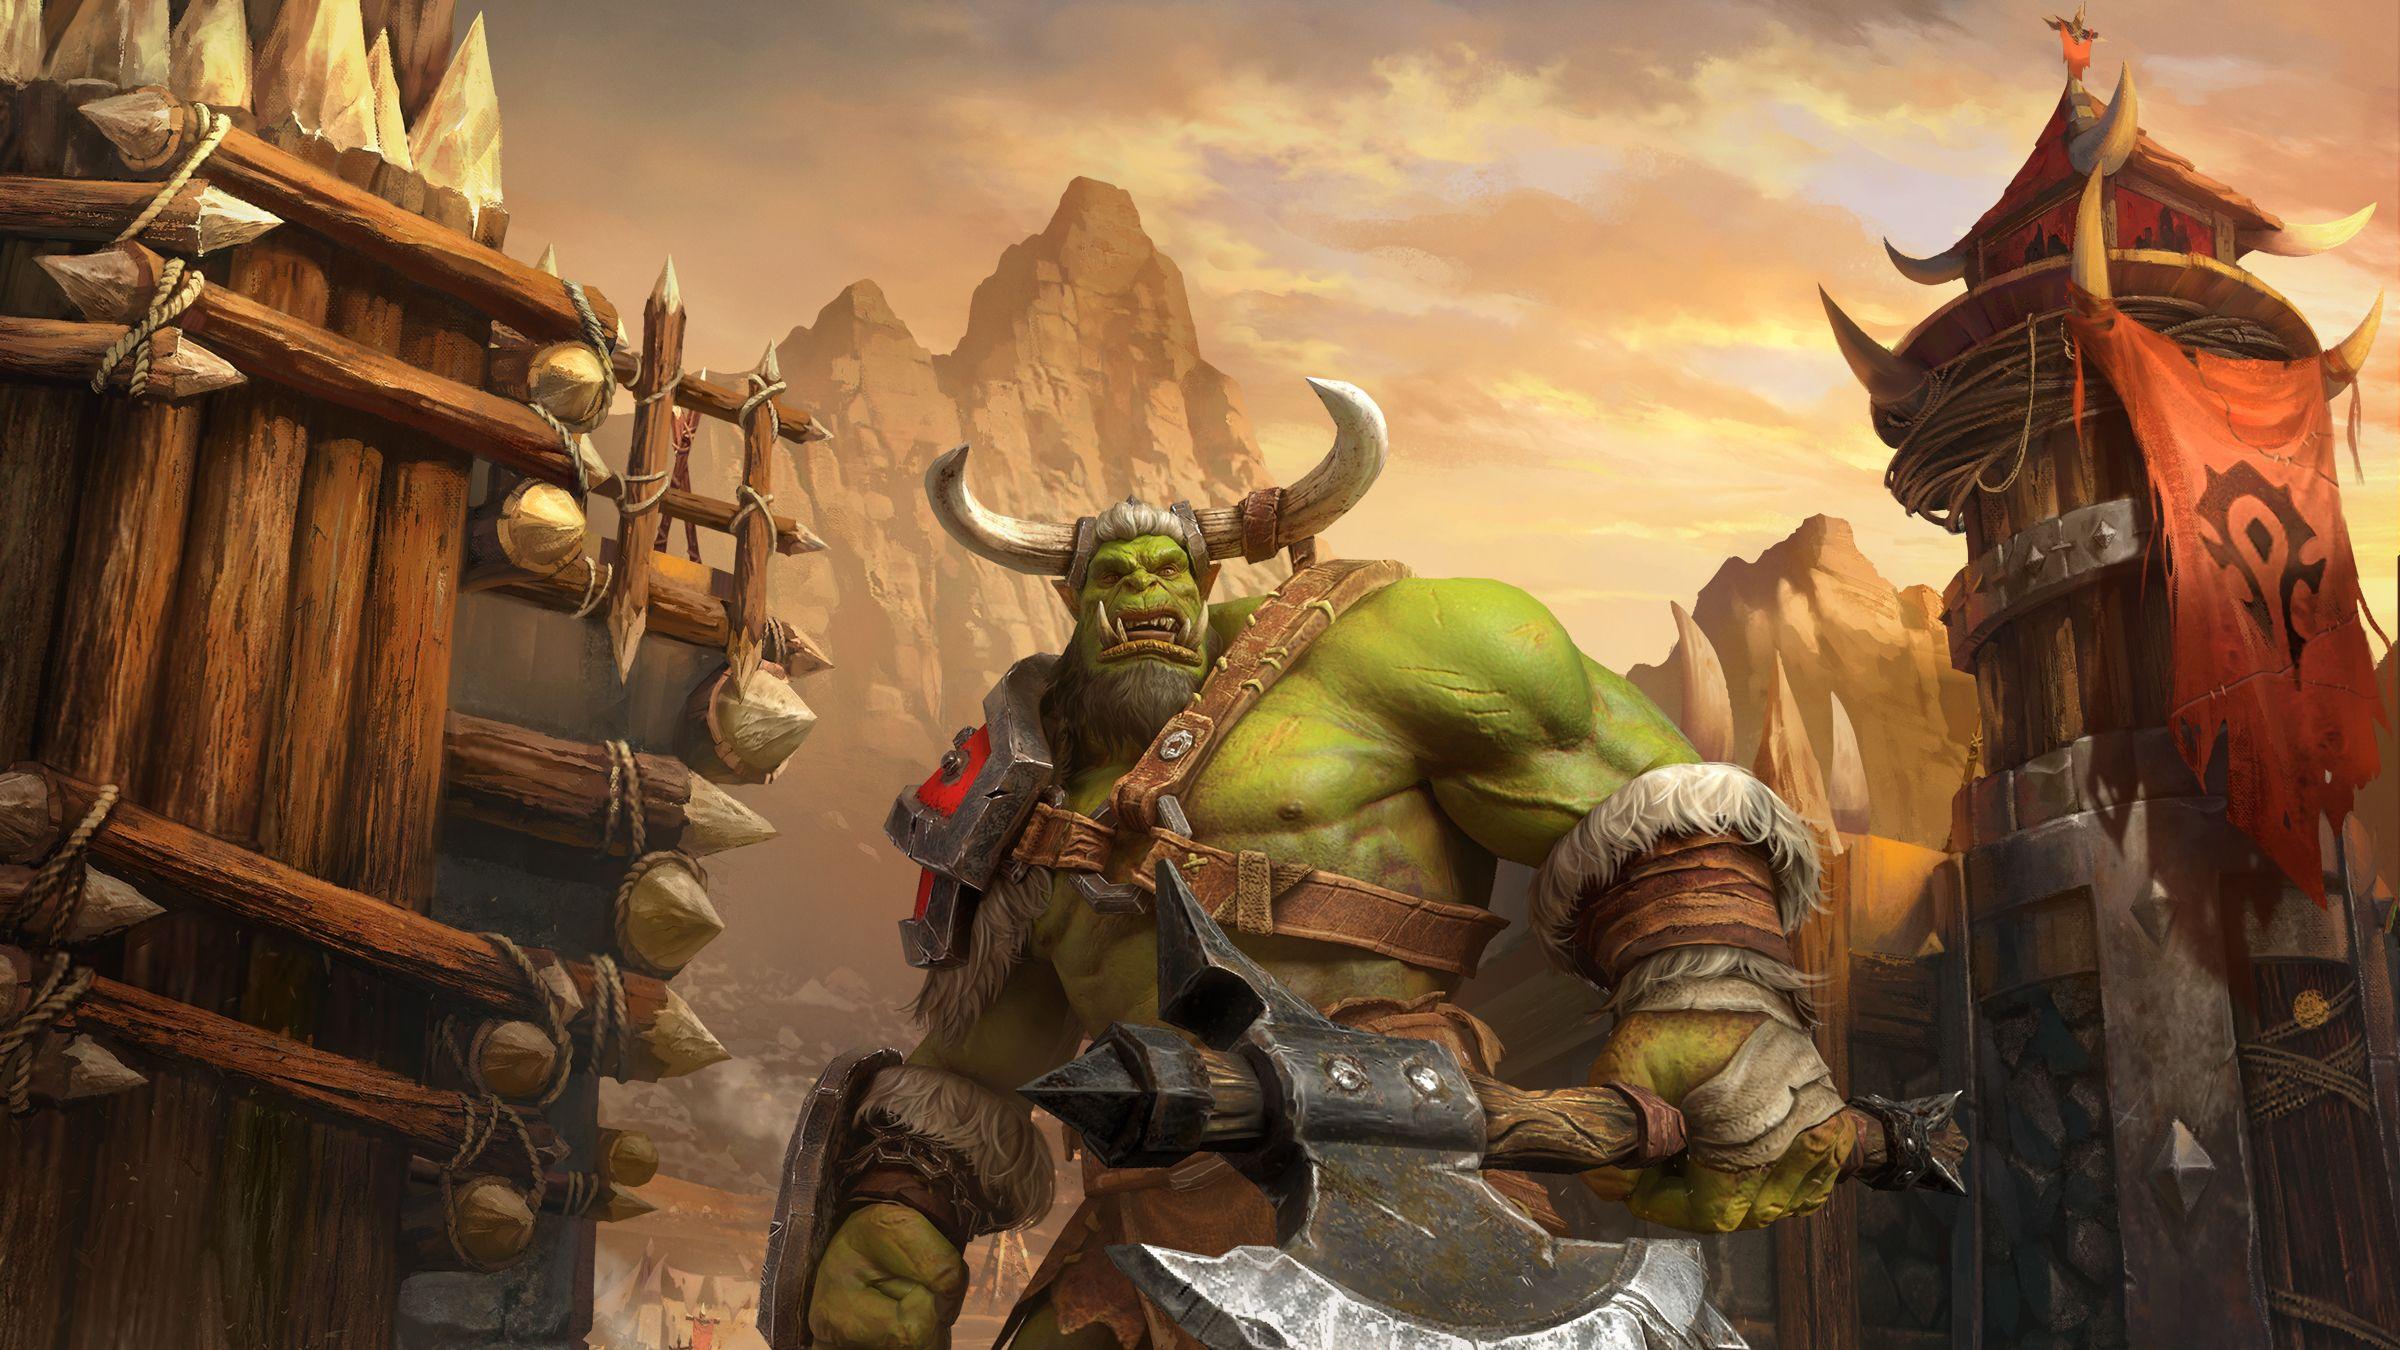 La guerra persa di Warcraft III: Reforged